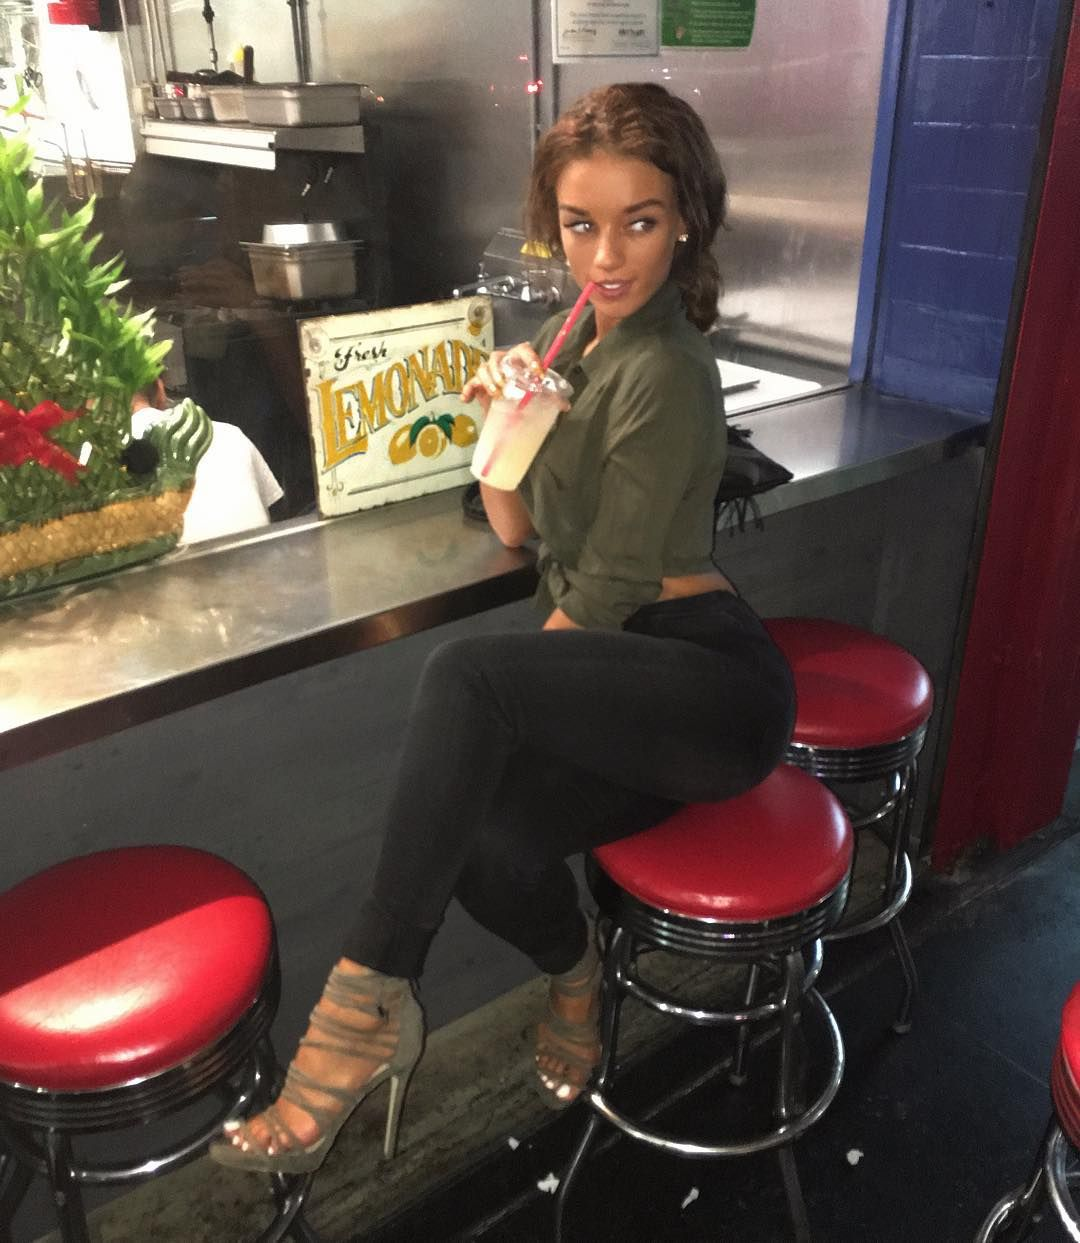 Be happy, fearless, & radiate positive vibes.  Actress | Believer | Biker | Tomboy  Snapchat & Twitter @ jenafrumes Business: jenasinstagram@gmail.com